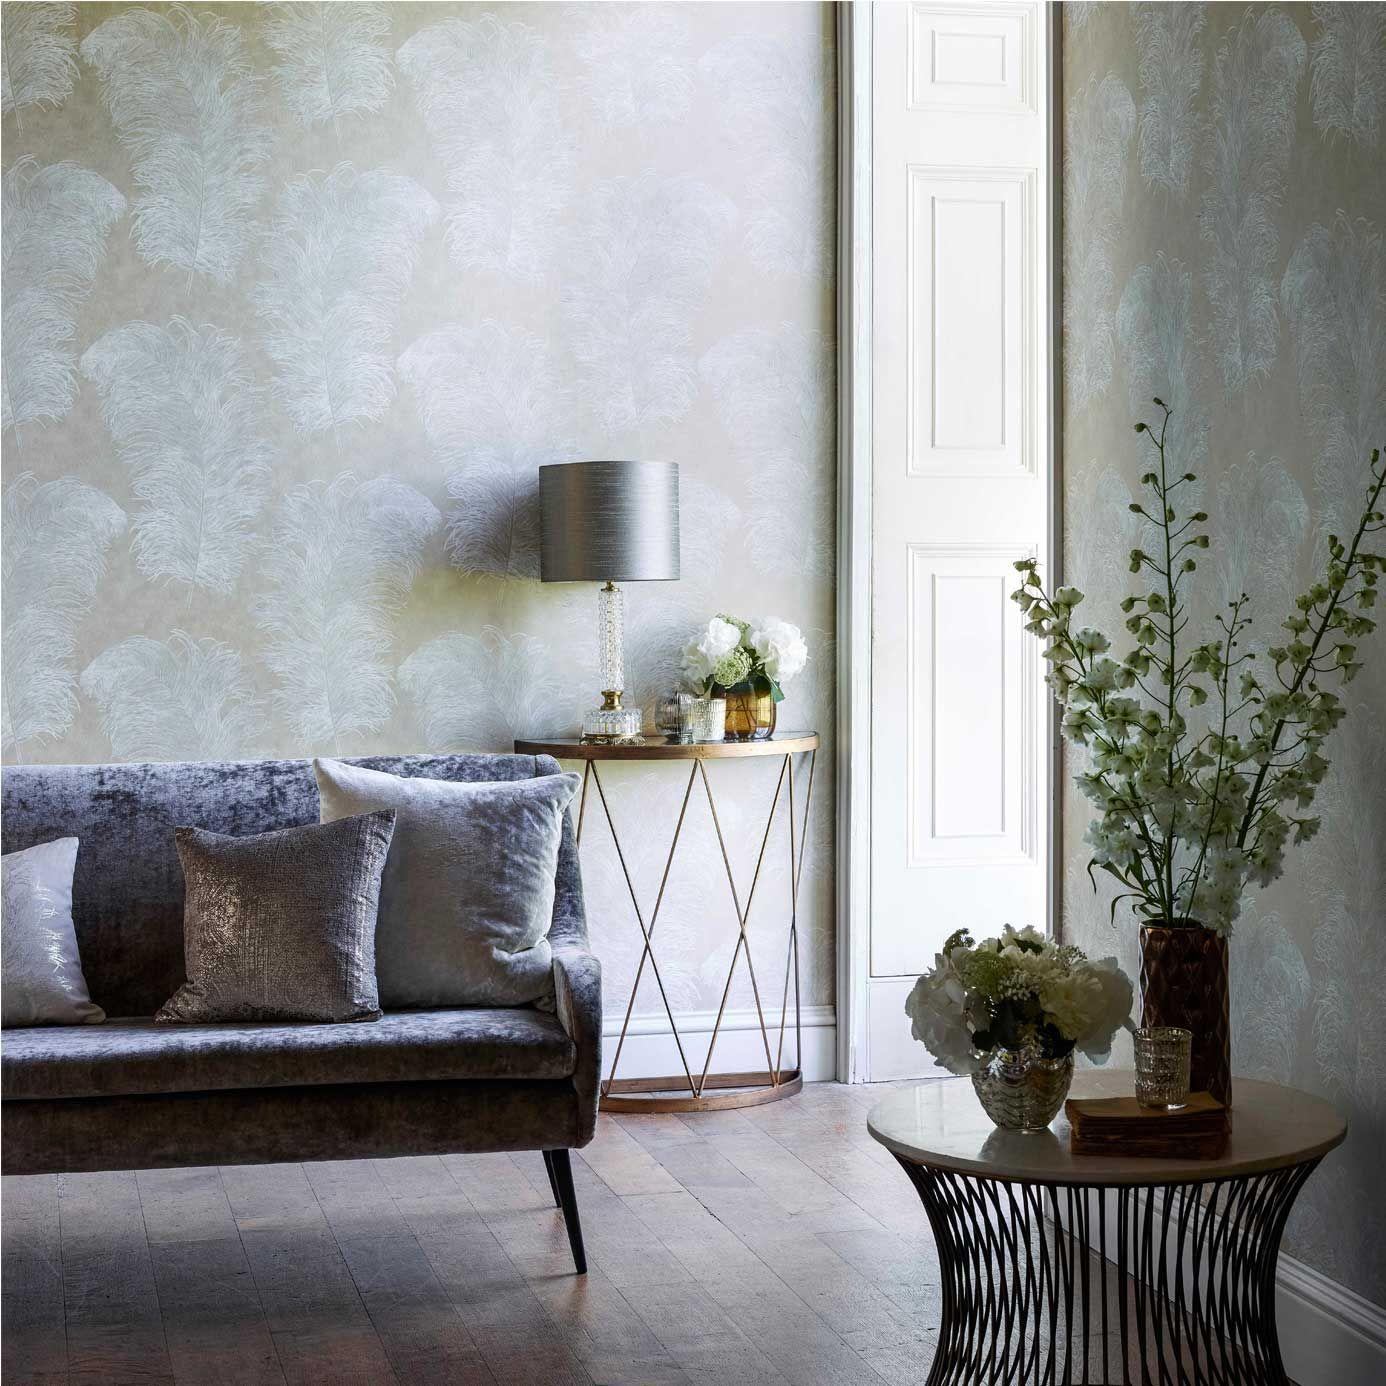 Products harlequin designer fabrics and wallpapers paradise - Products Harlequin Designer Fabrics And Wallpapers Operetta Hgat111236 Palmetto Wallpapers